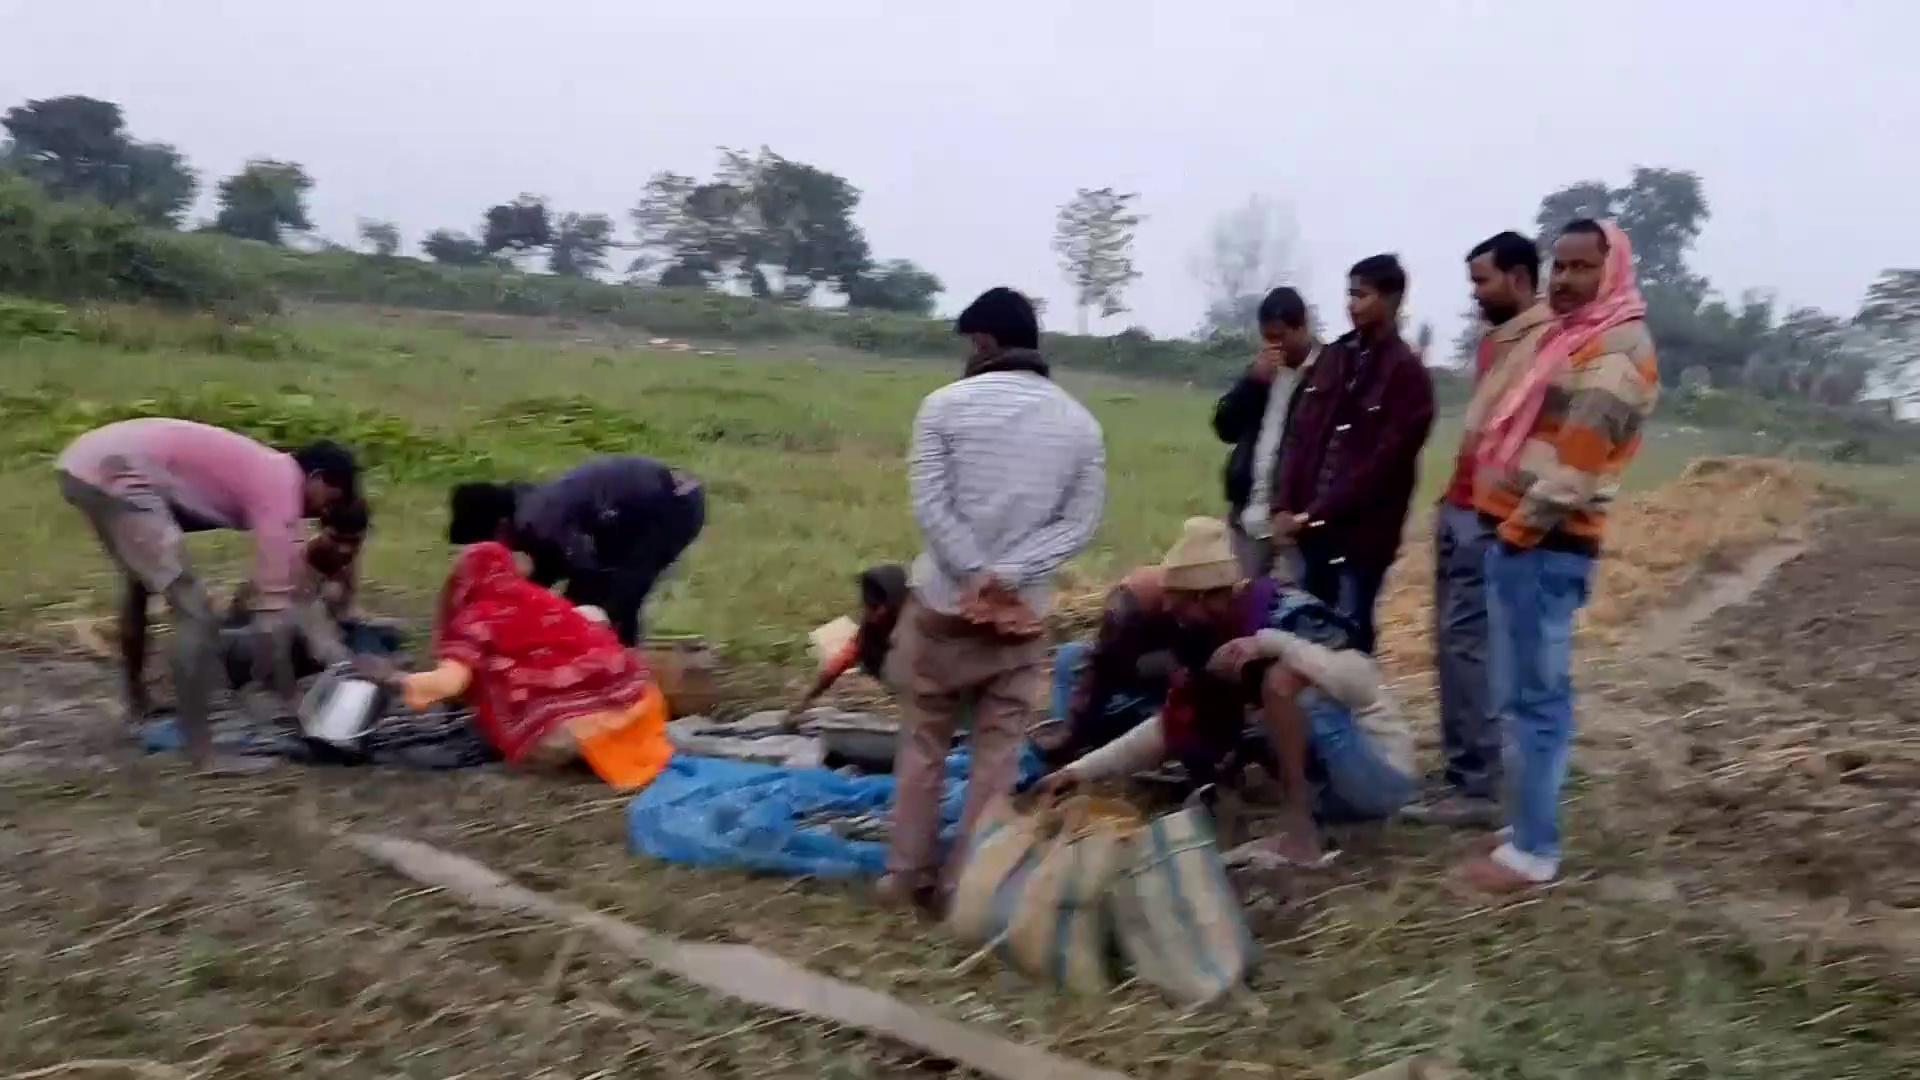 मछली पकड़ने का देसी स्टाइल? | How to pick fish from mud? | Fish Farming in Village | Mud Fish Farming